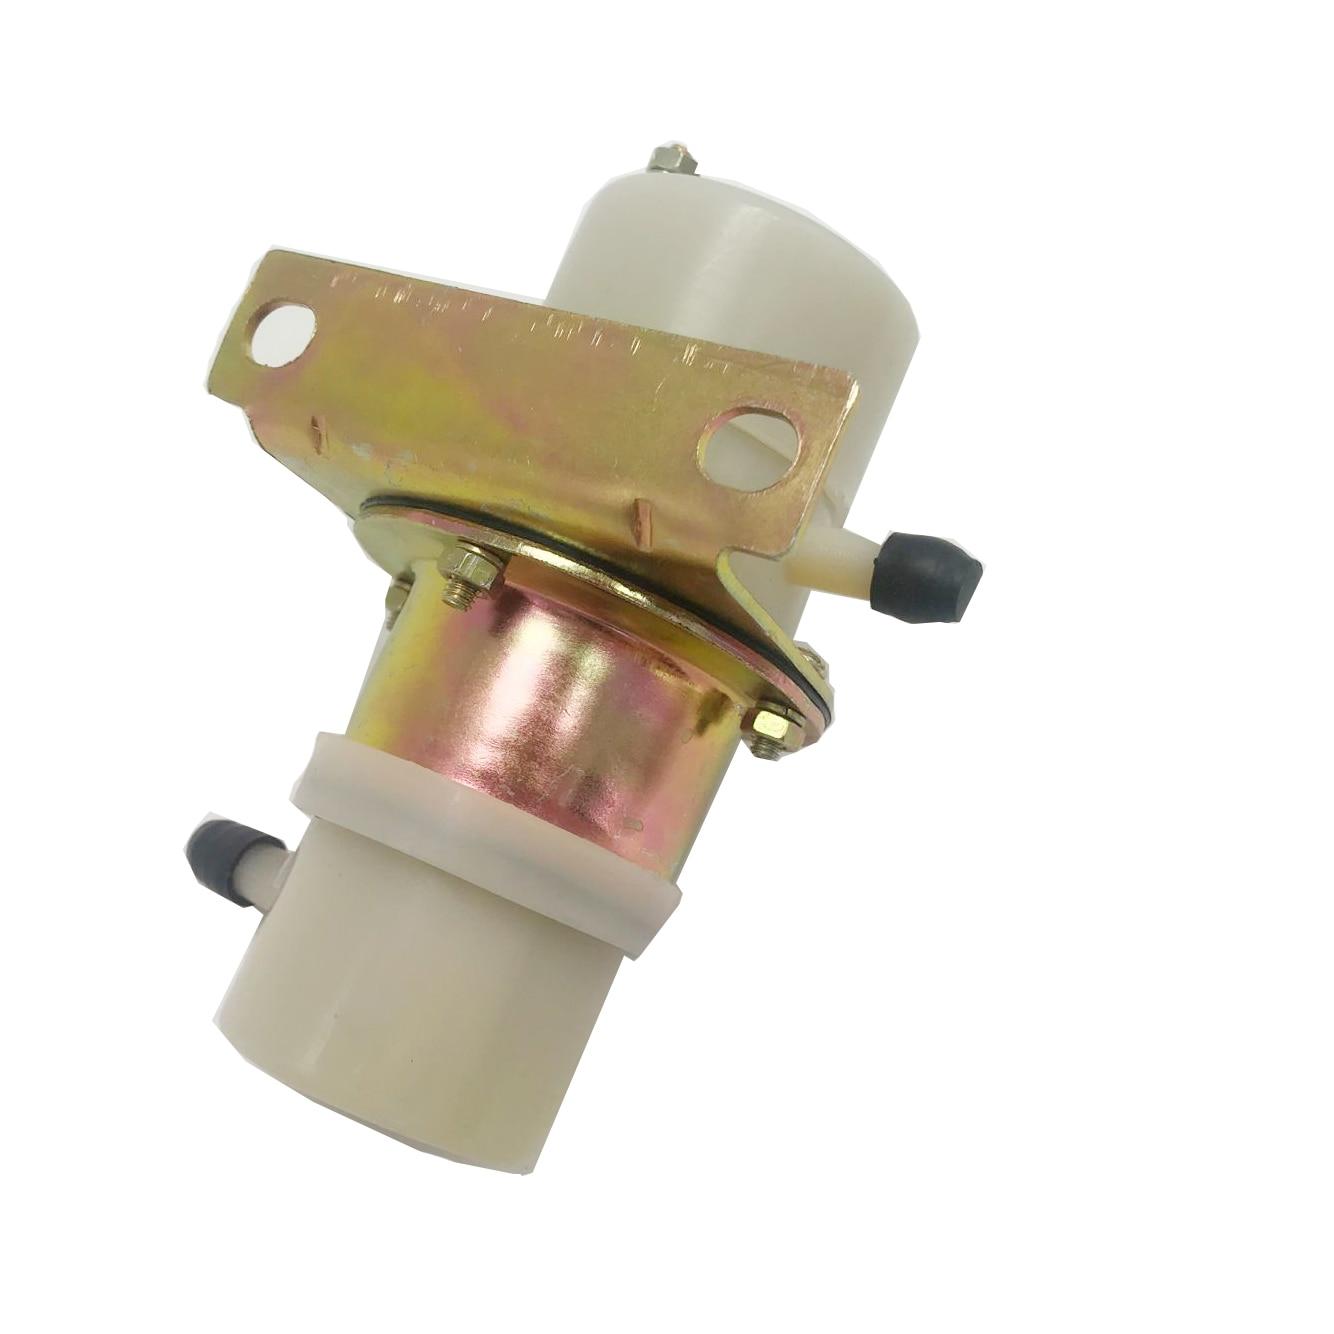 Oil Filter 270Q-17000 for Joyner 650 Sand Spider Commando Kinroad Goka Roketa